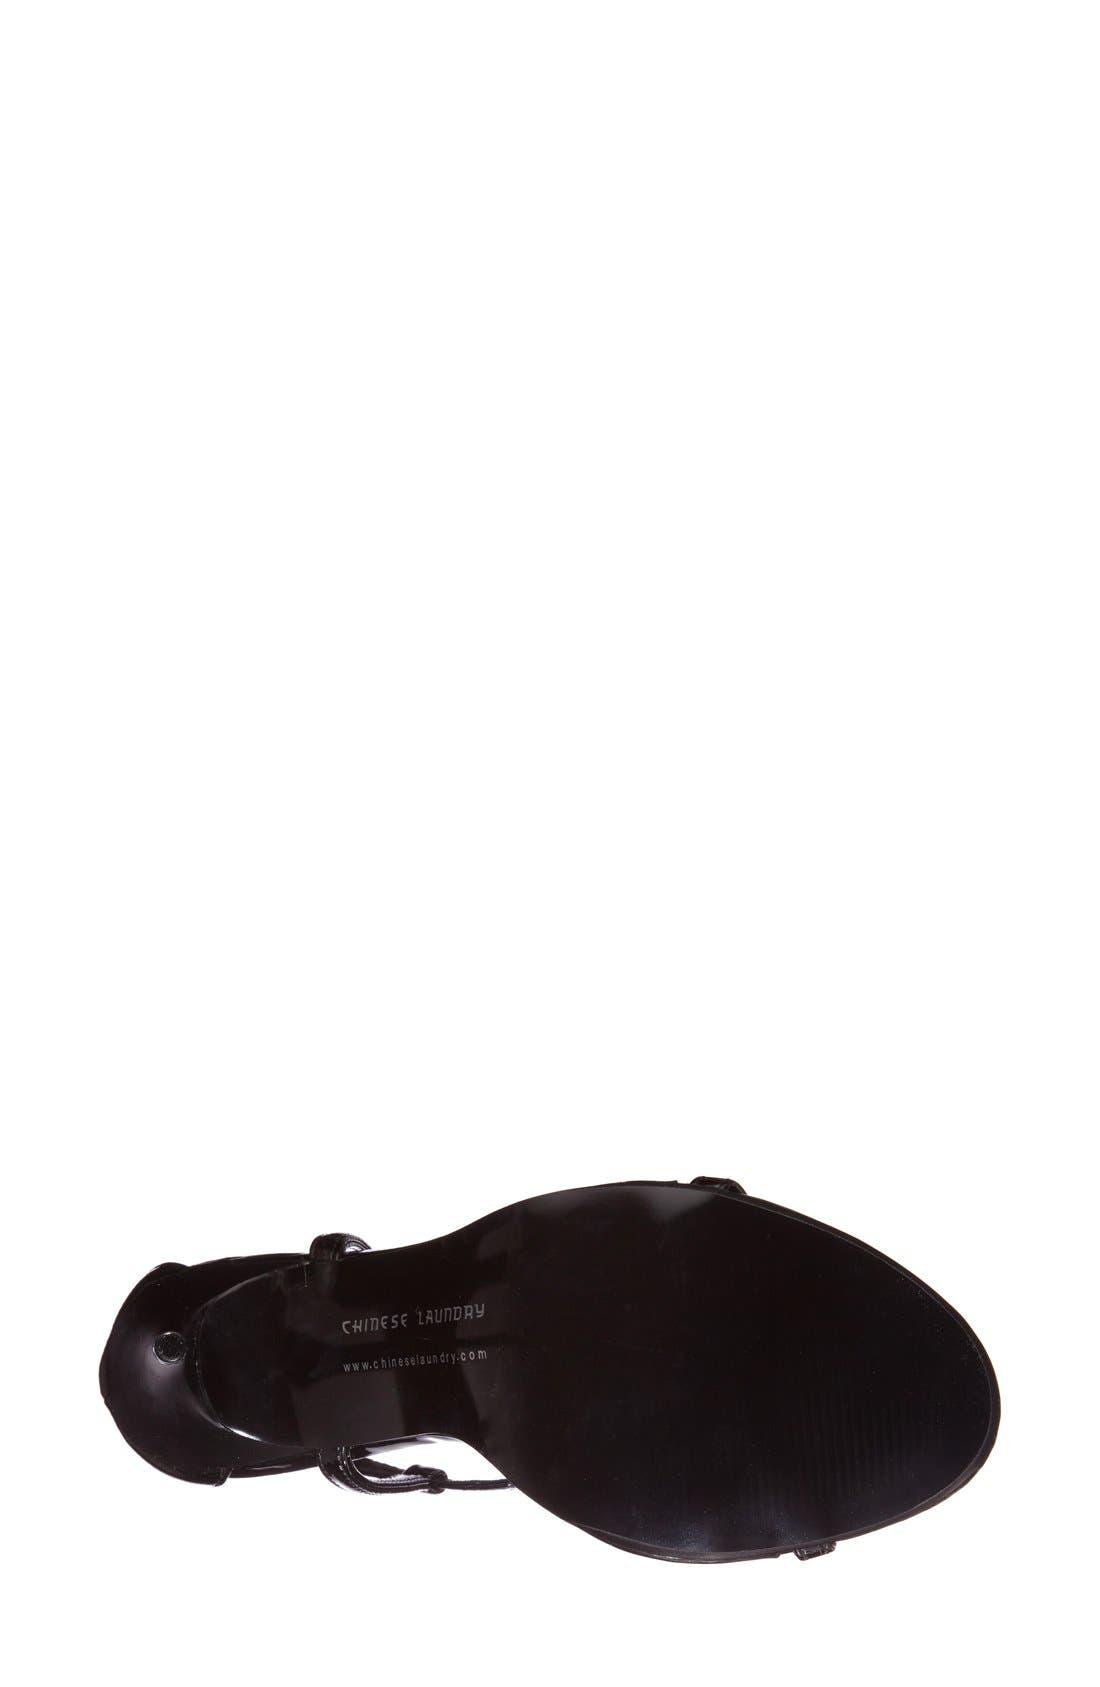 CHINESE LAUNDRY, 'Leo' Patent T-Strap Sandal, Alternate thumbnail 3, color, 001